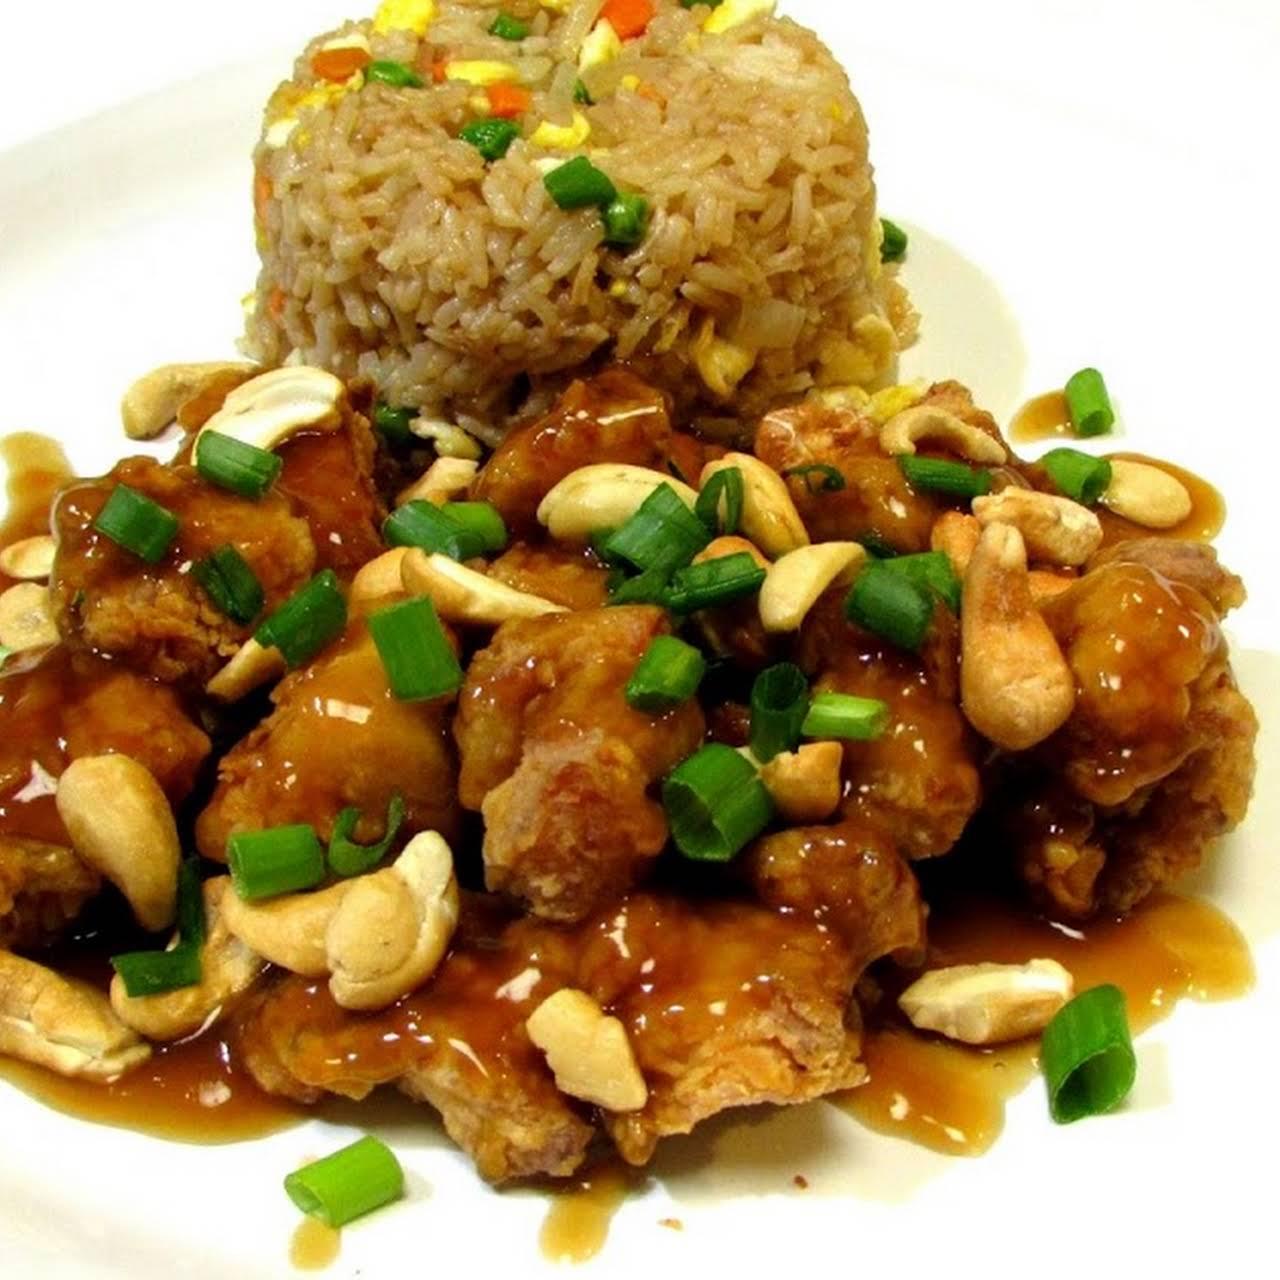 Springfield Style Cashew Chicken (copy cat recipe) - Leongs Tea House